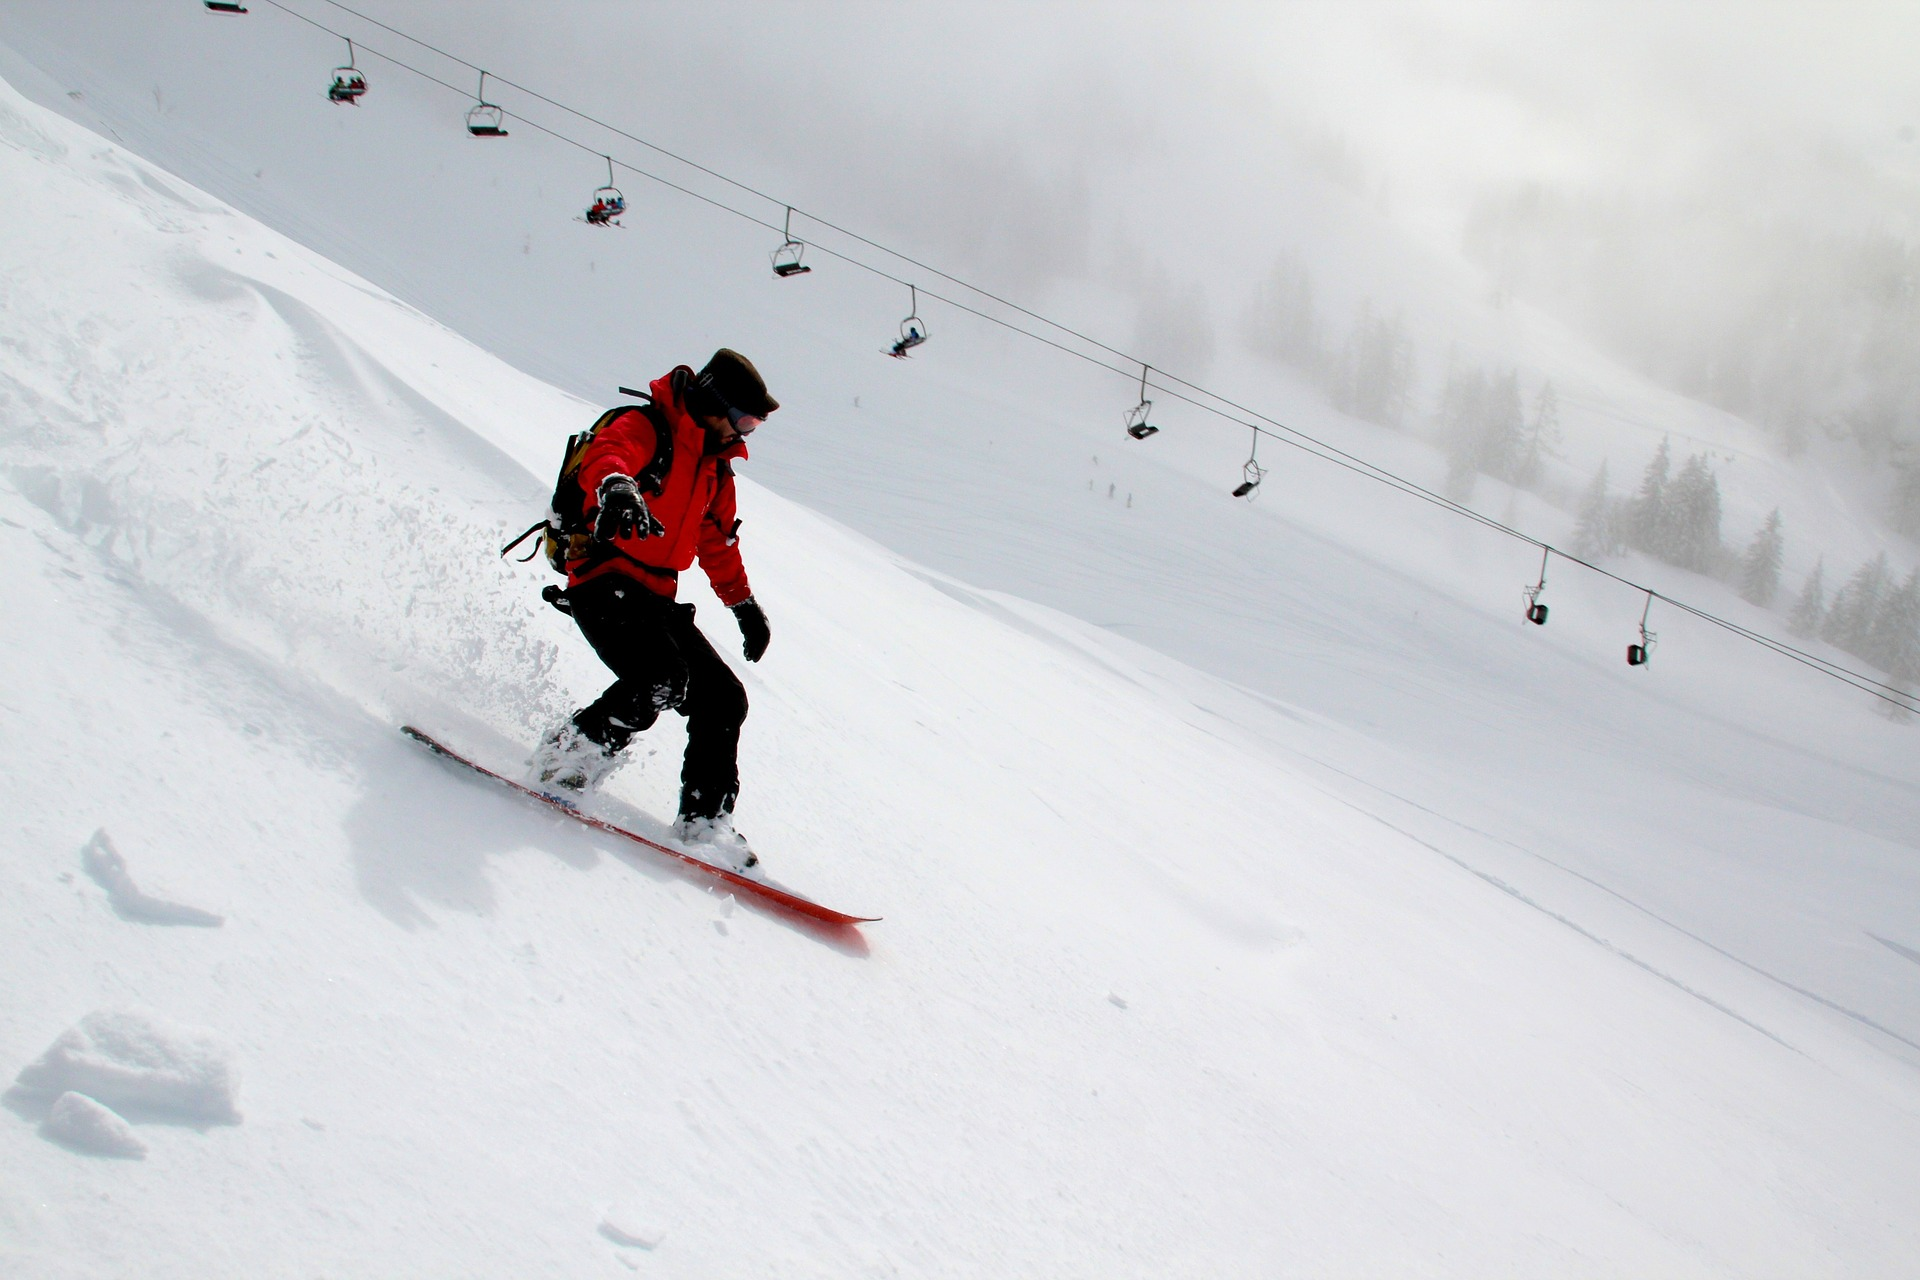 snowboarding-554048_1920.jpg